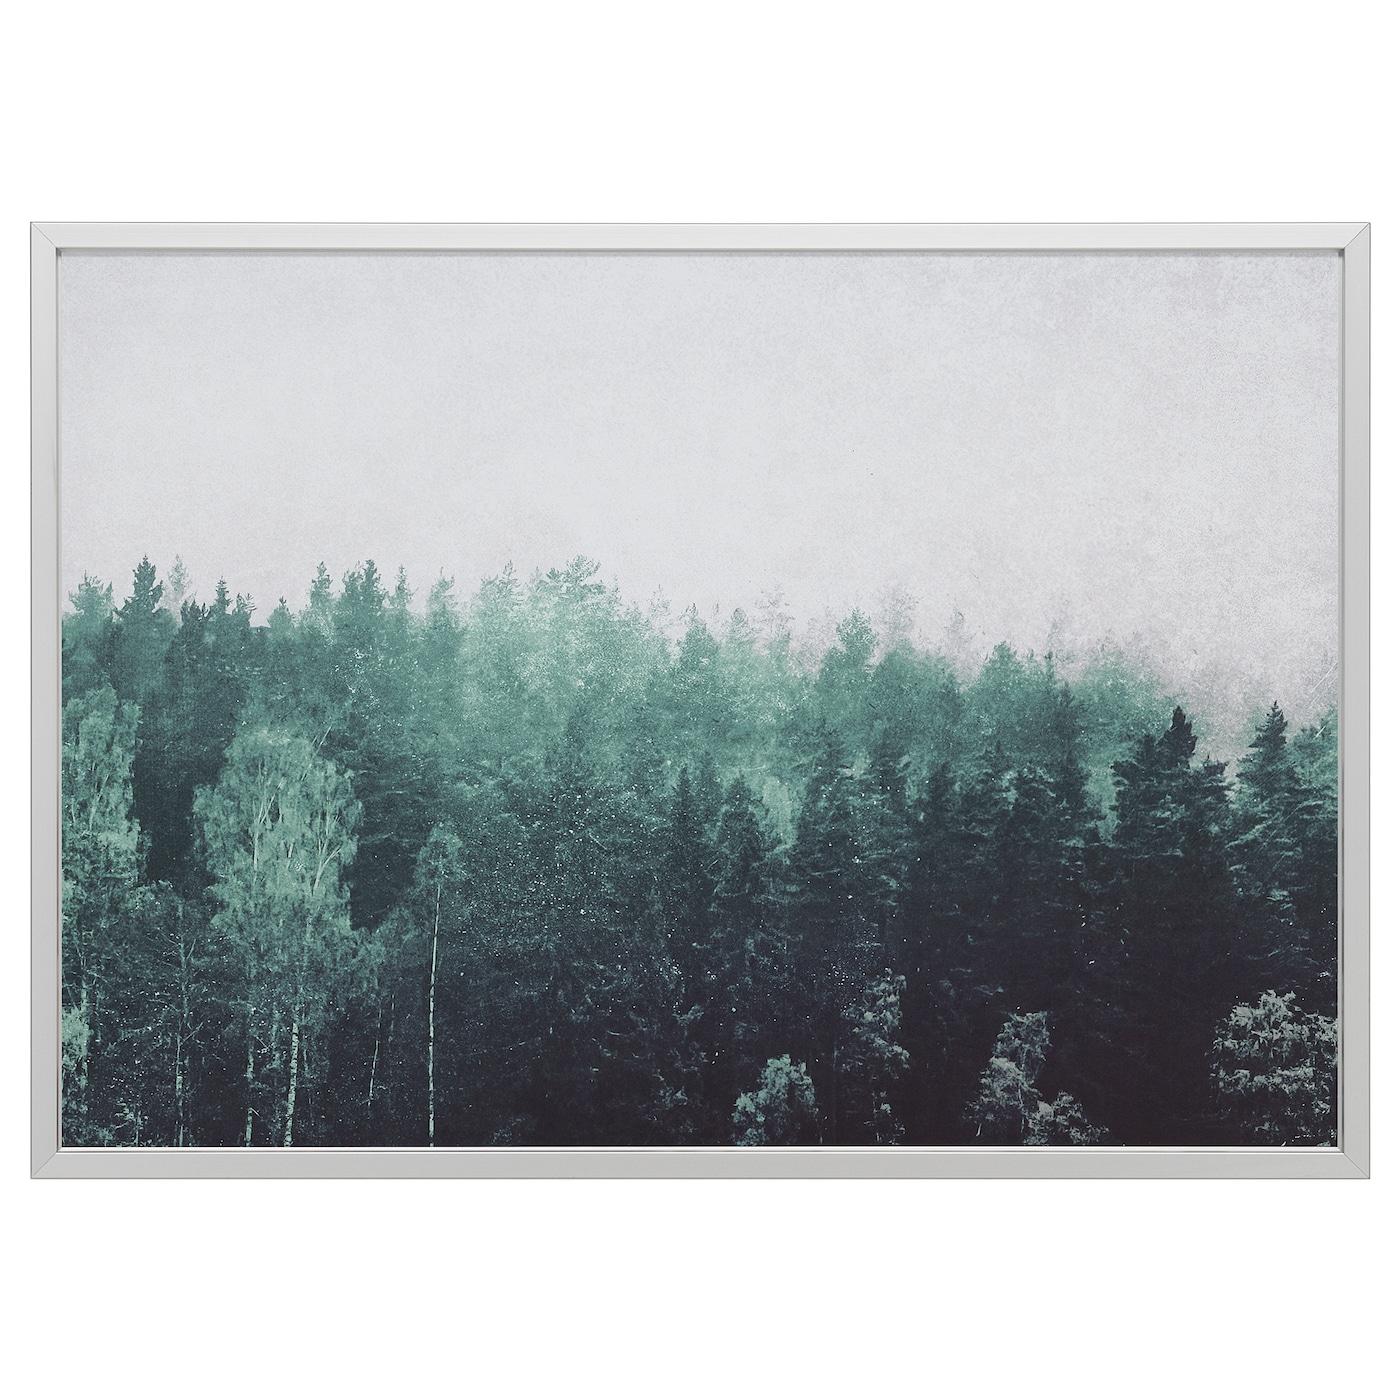 ready to hang art canvas prints, framed art \u0026 more ikeaIkea Abstract Grey #1